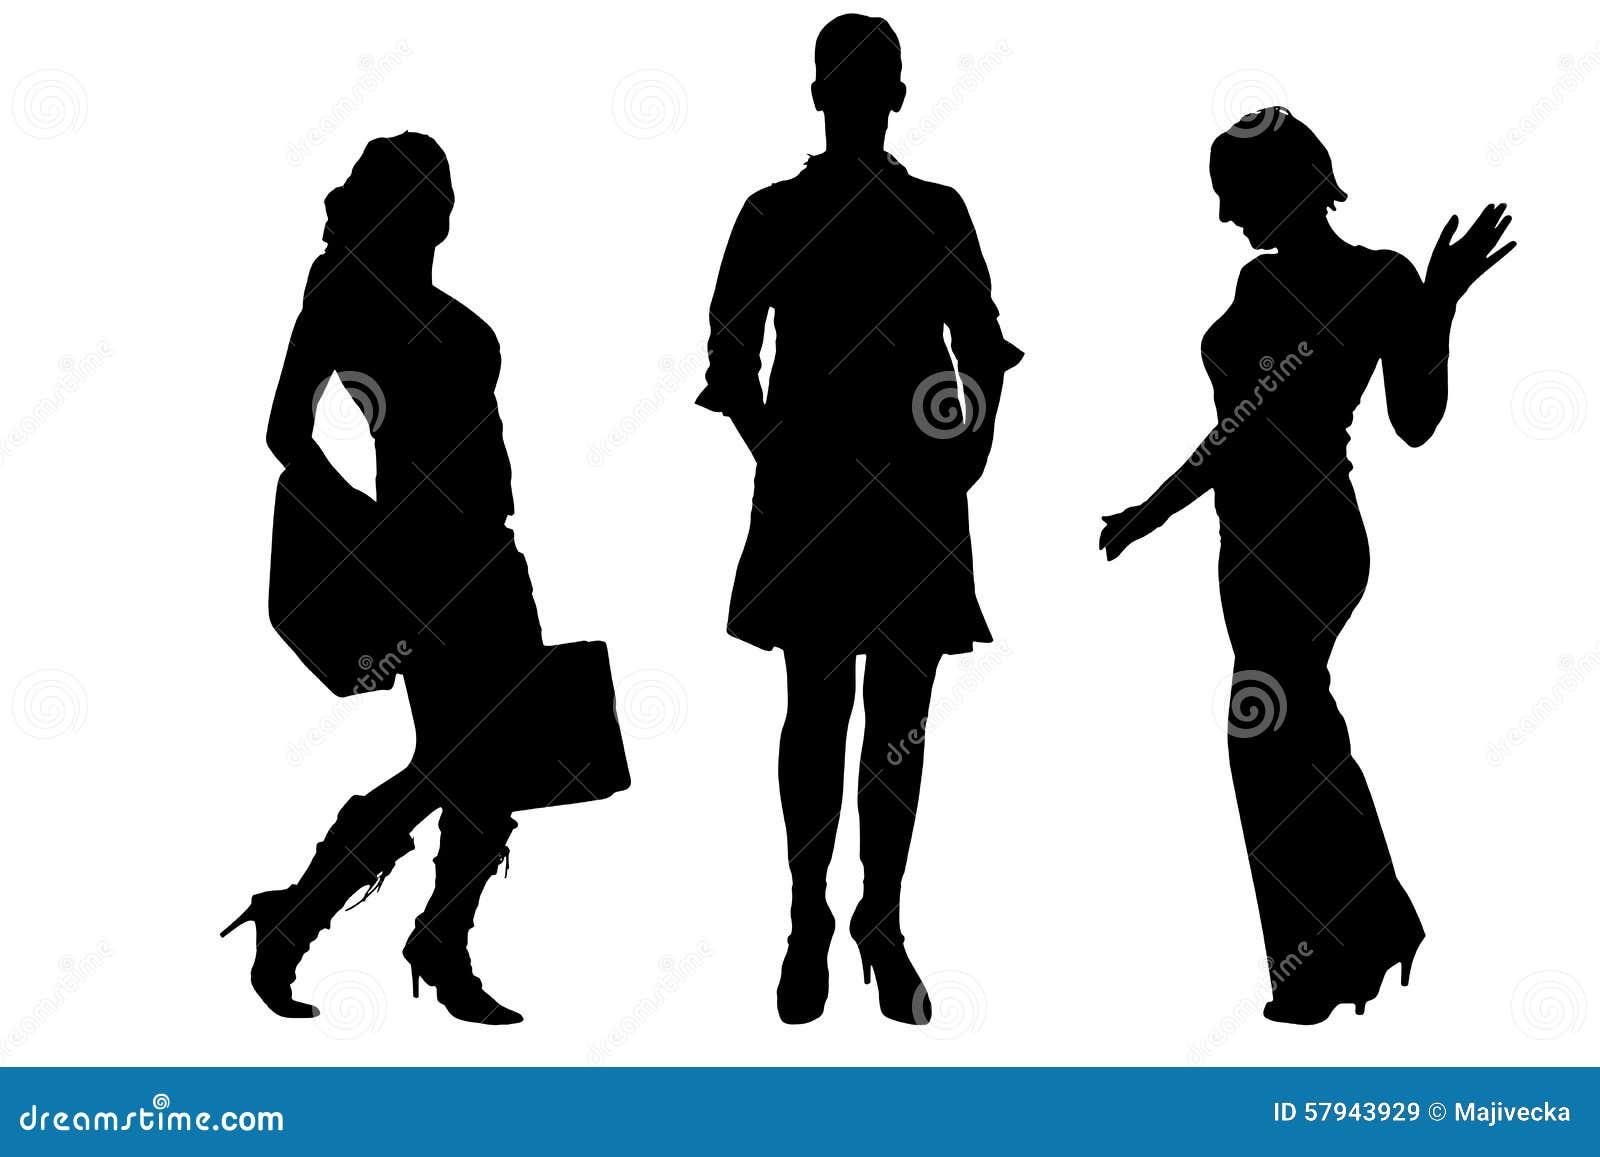 vector silhouette of a women stock illustration illustration of